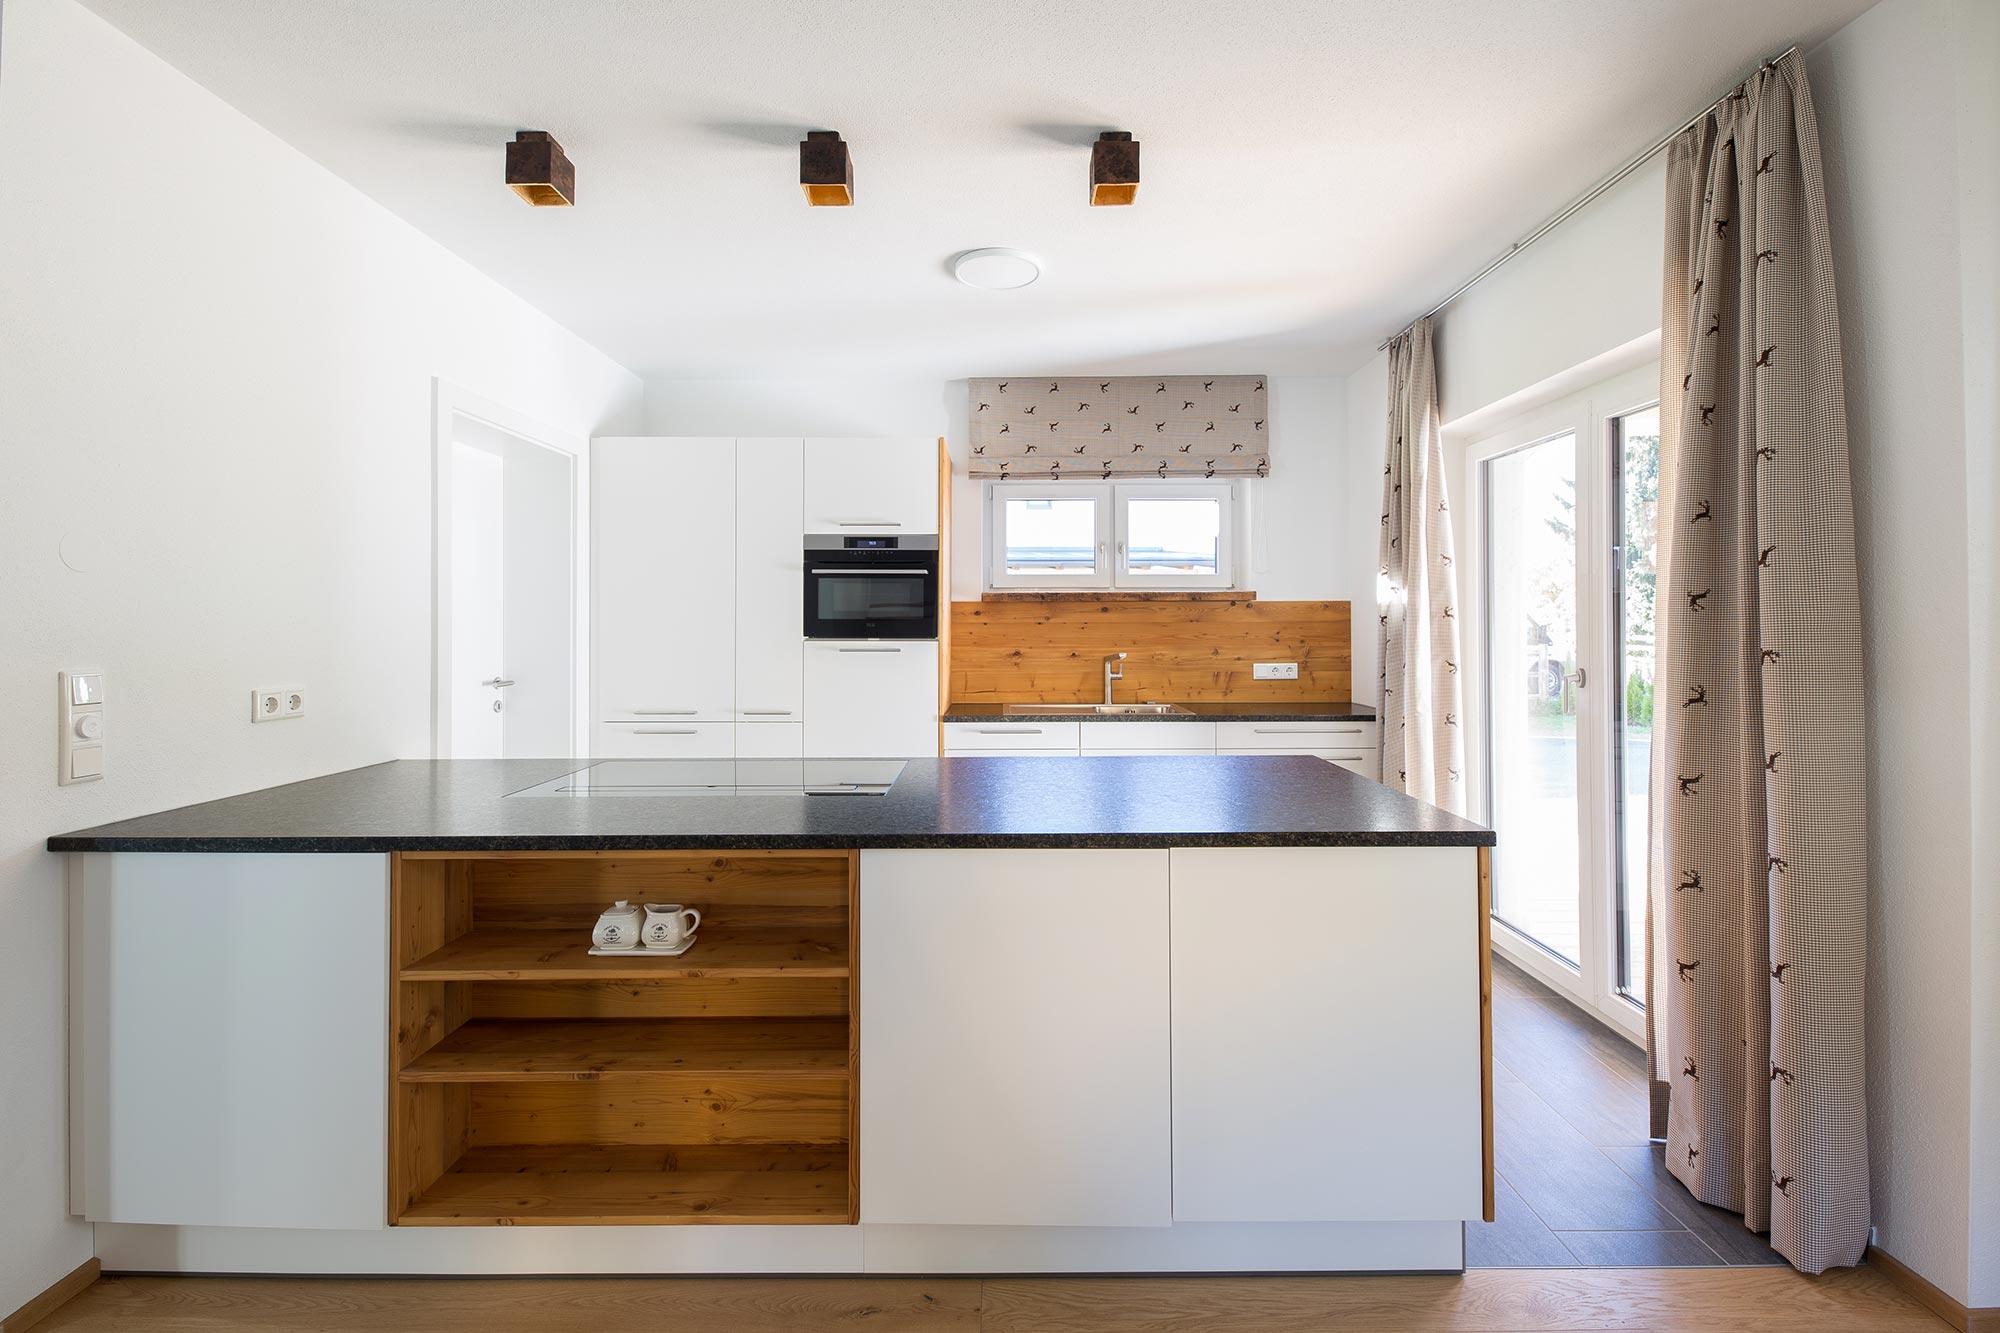 chalet urlaub chalet. Black Bedroom Furniture Sets. Home Design Ideas